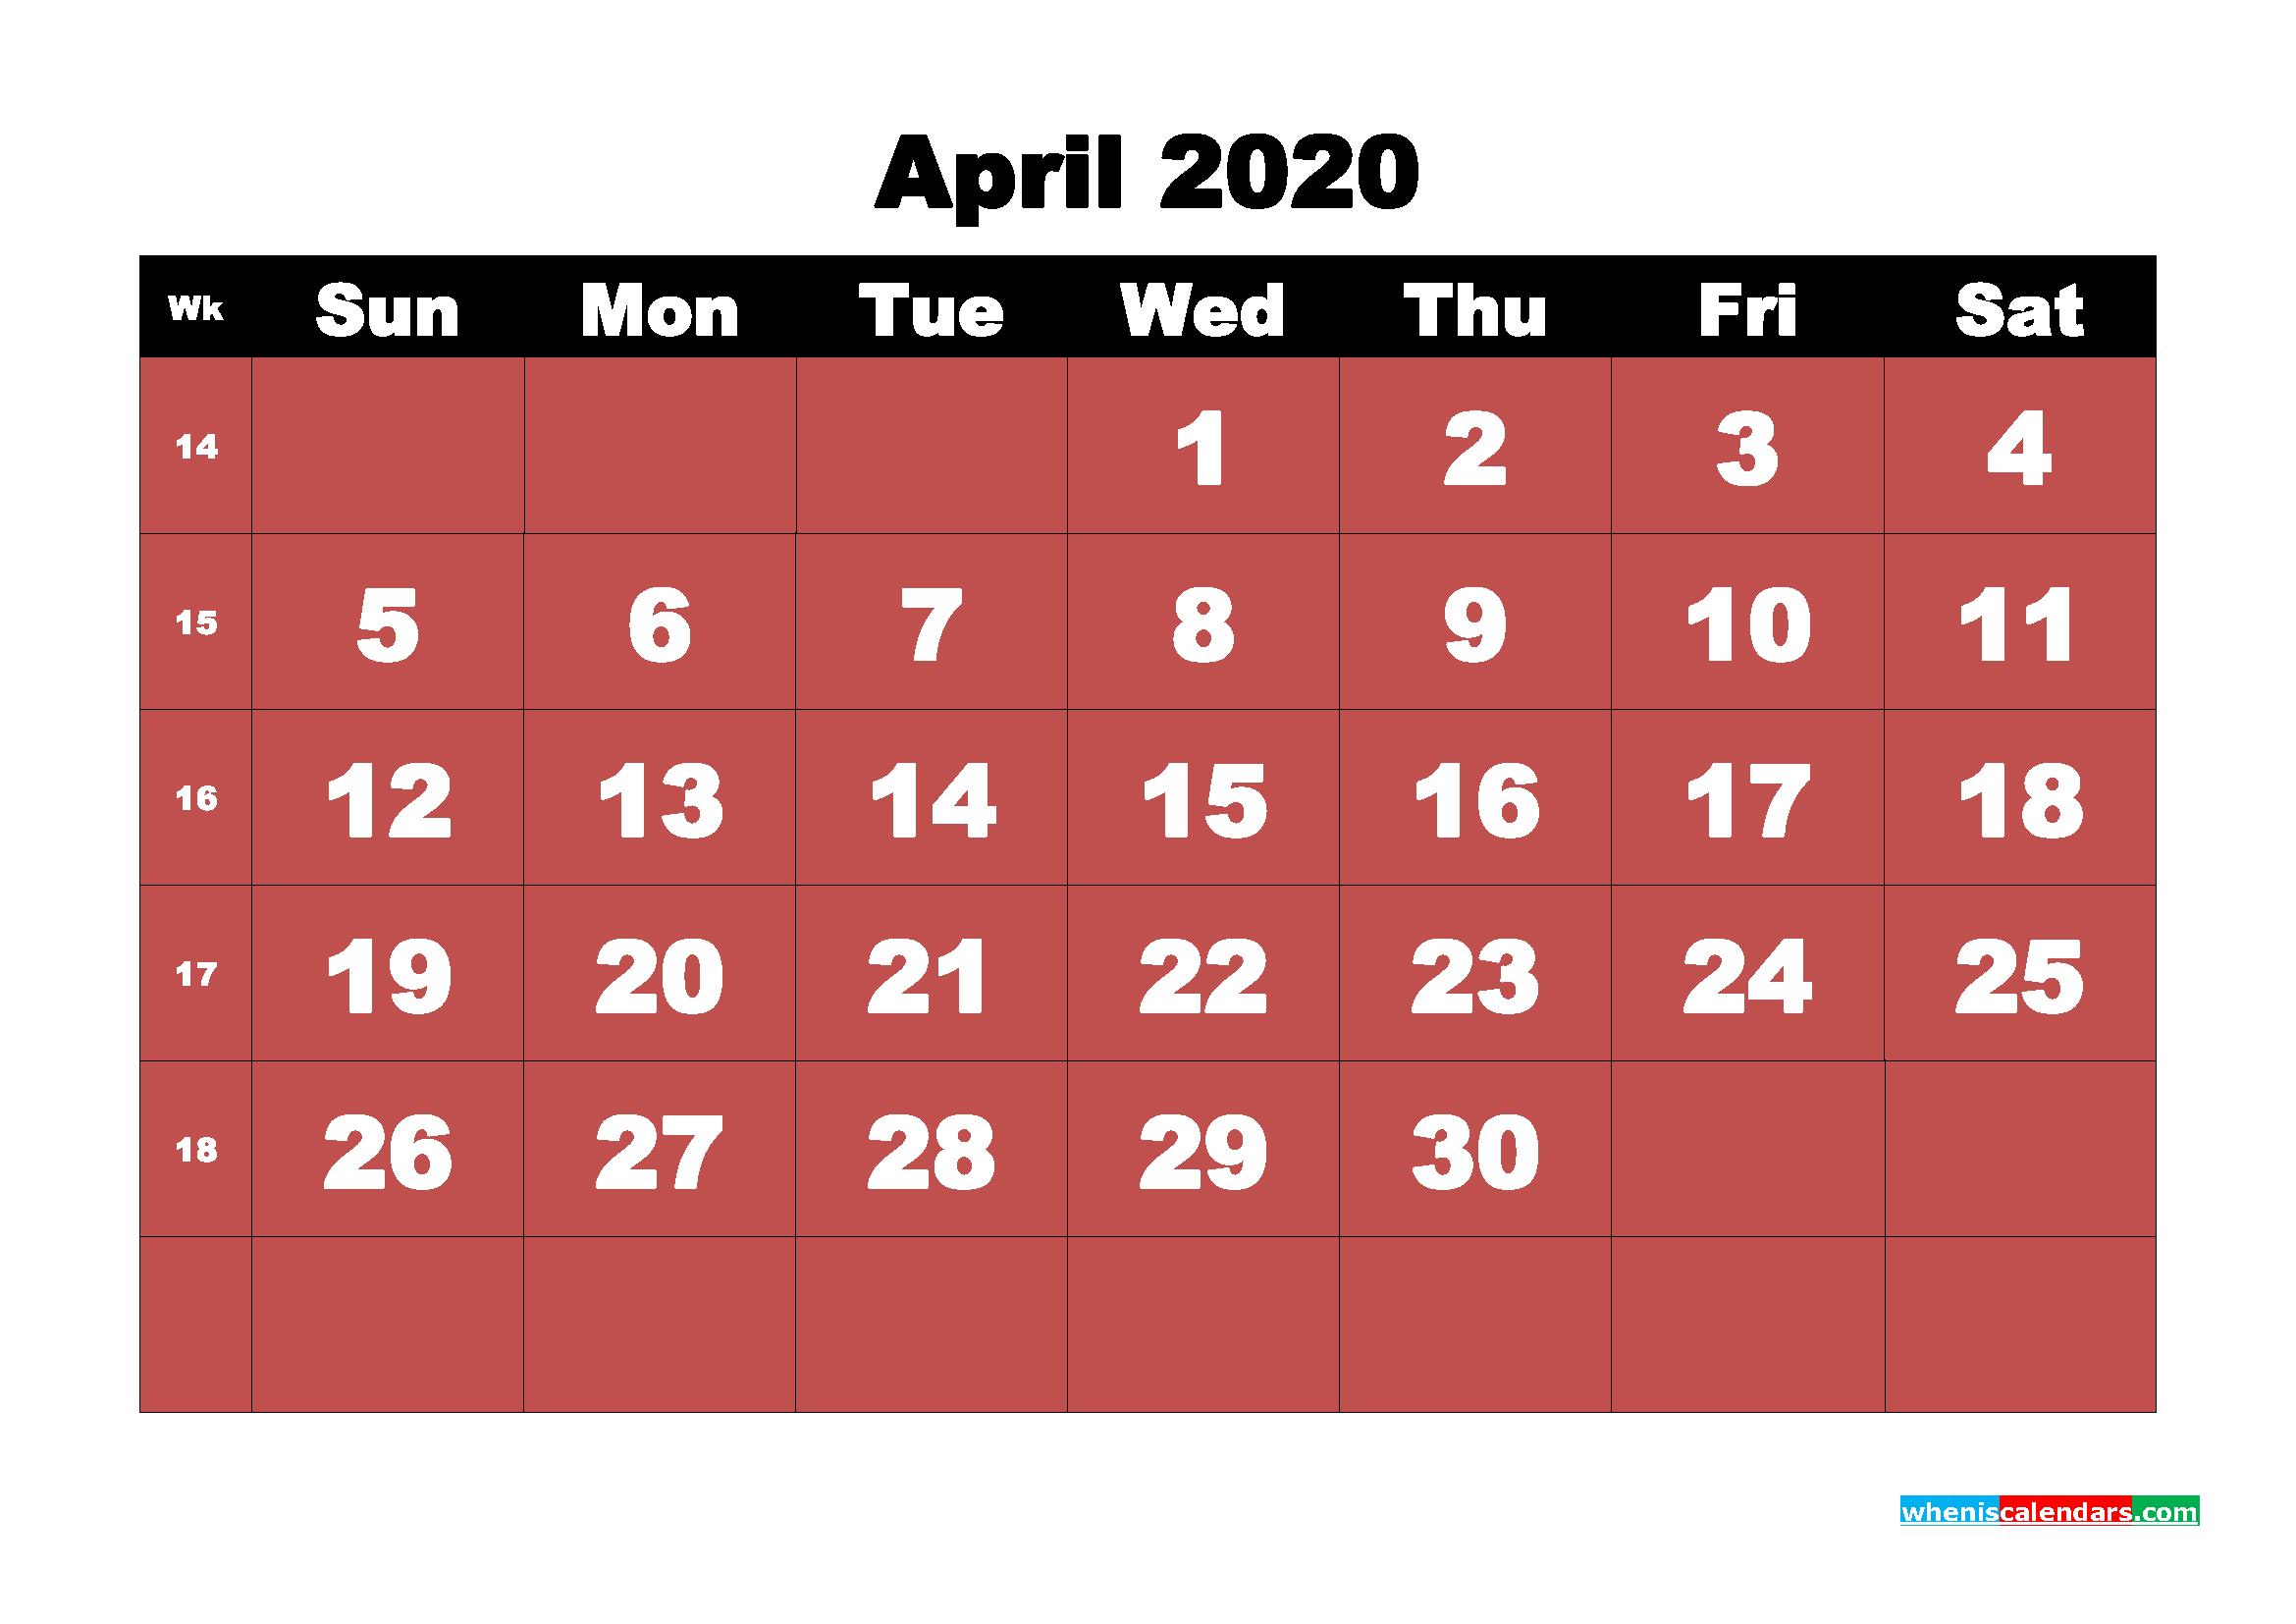 April Printable Calendar 2020 PDF, Word - No.m20b16